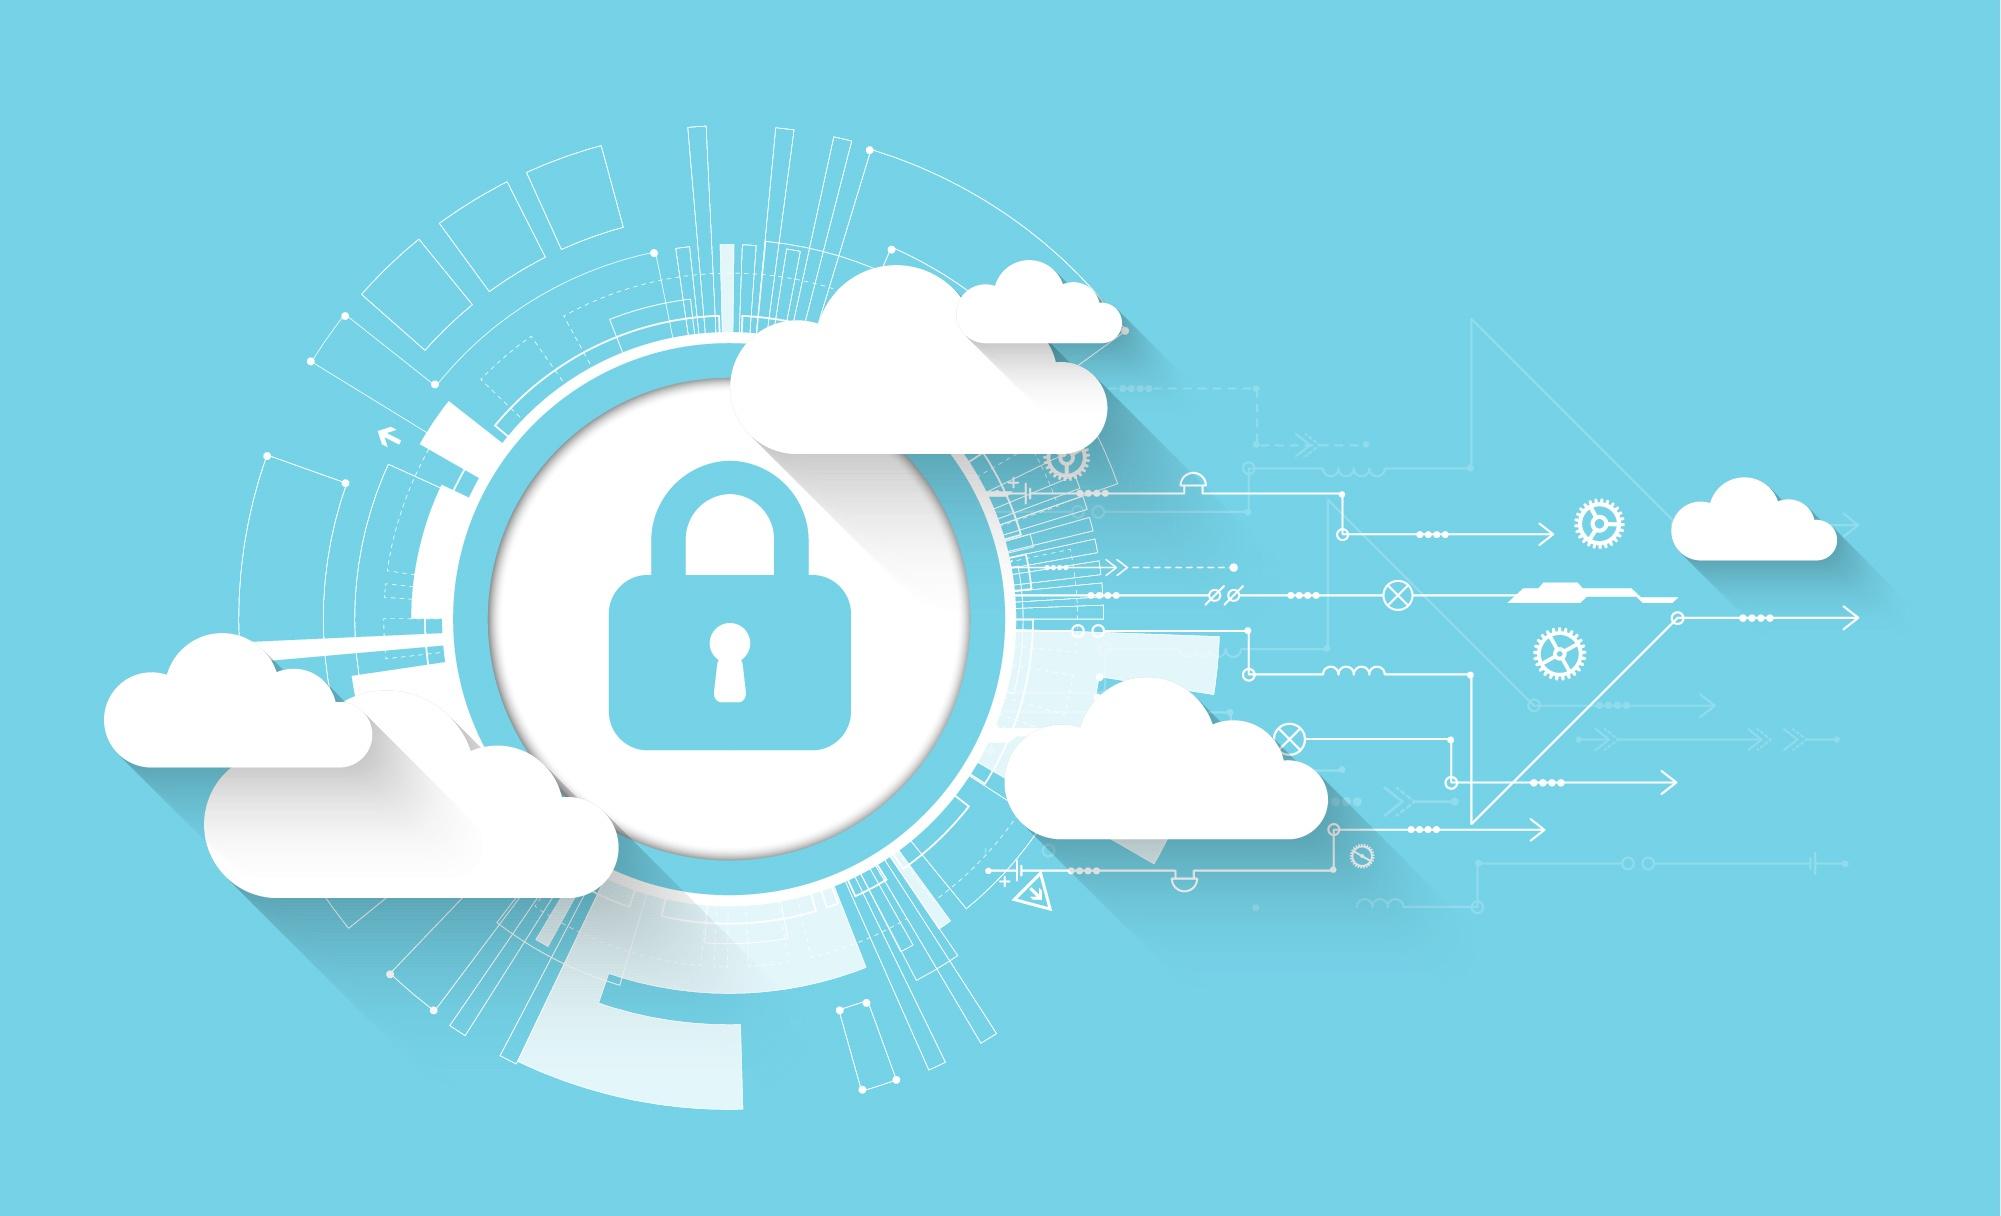 Metaswitch First to Put STIR/SHAKEN Caller ID Authentication Solution through ATISRobocalling Testbed